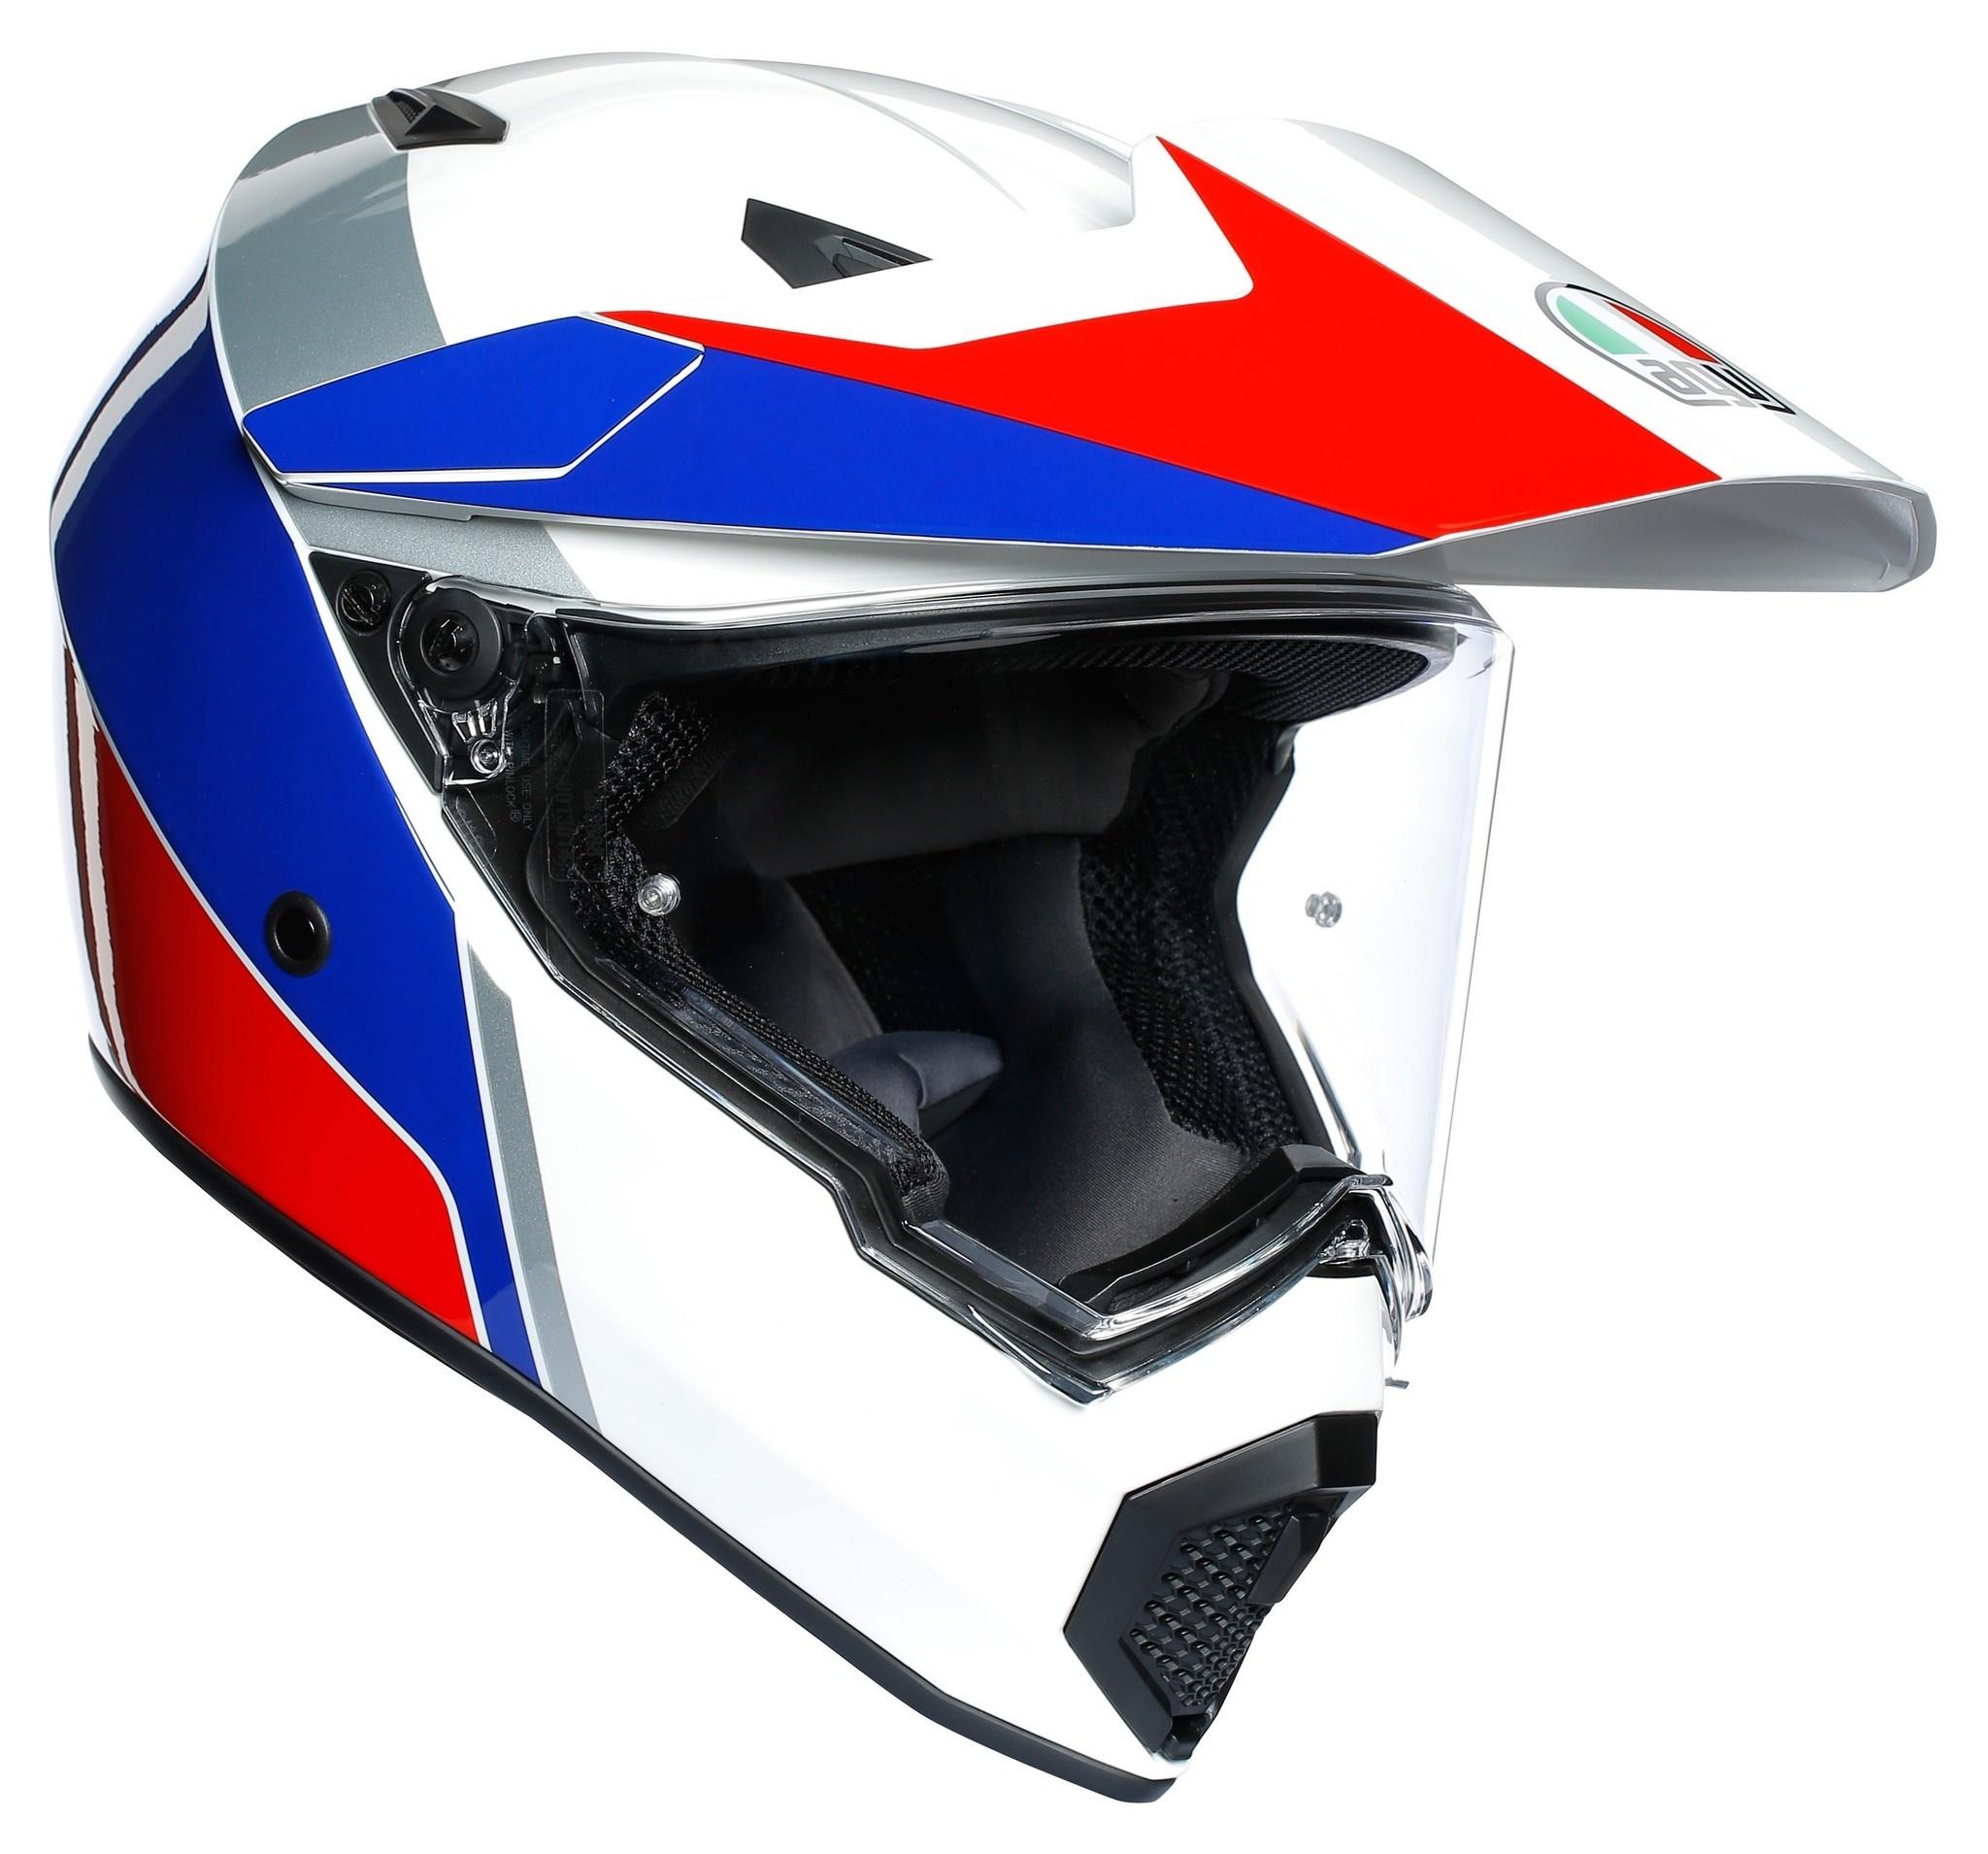 Sidi Crossfire 3 SRS Stiefel Champion Helmets